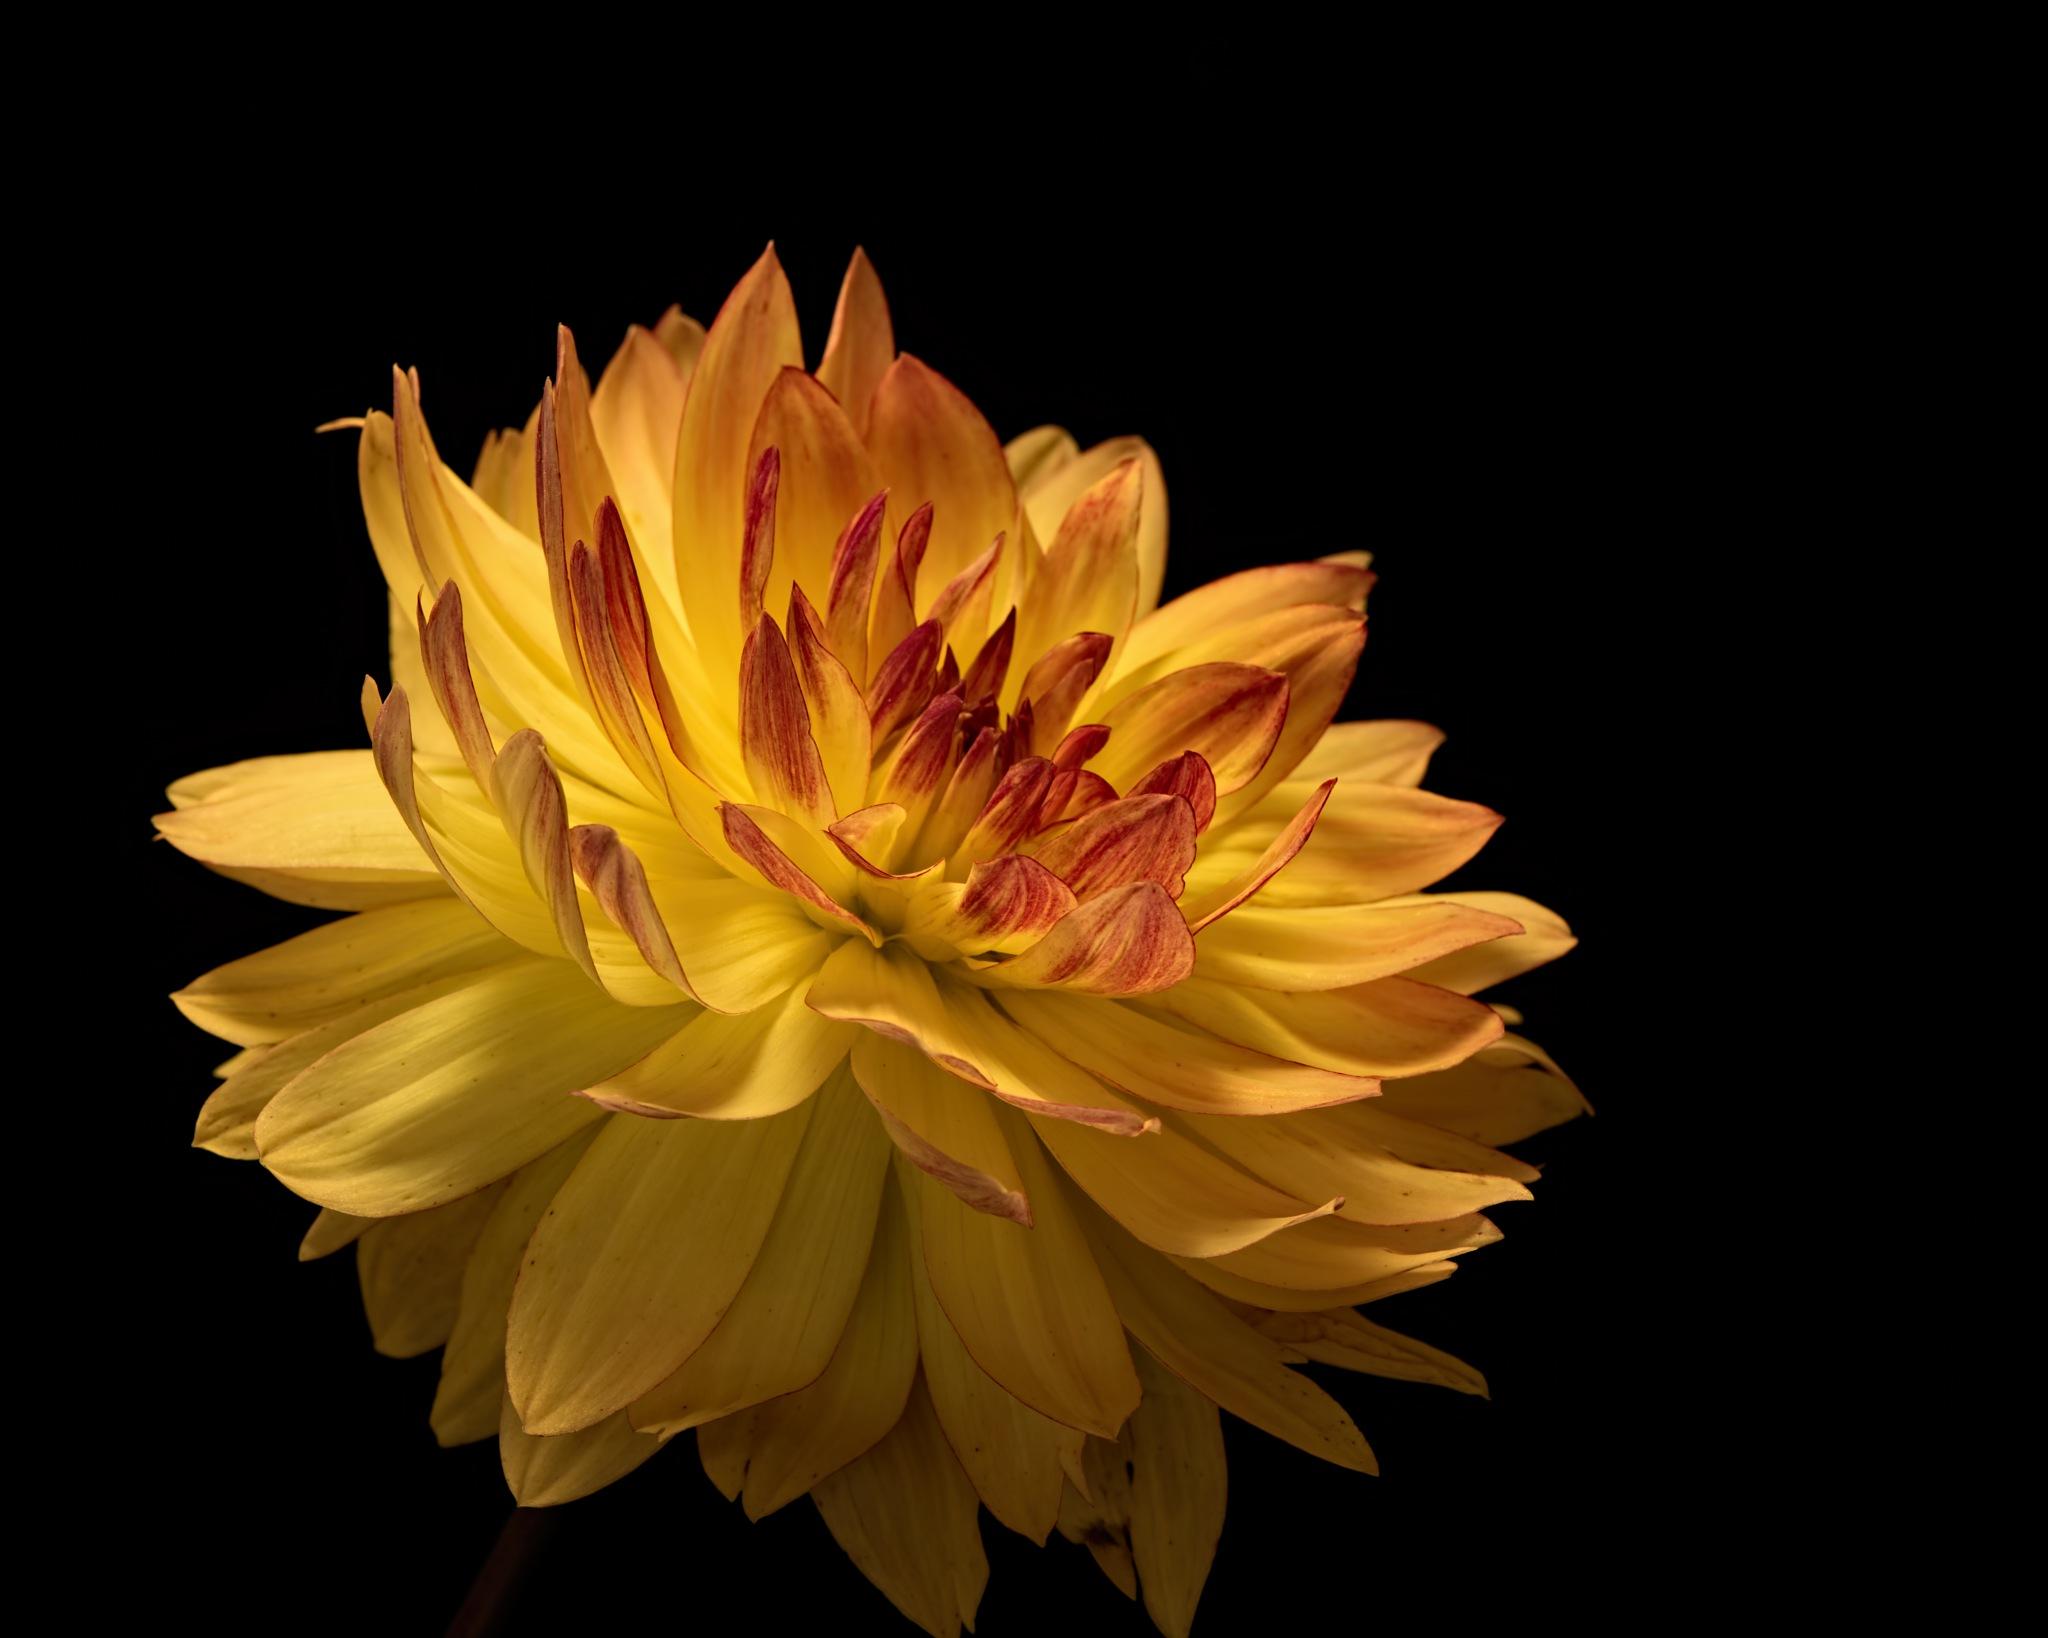 Yellow Dahlia 0820 by ThomasJerger